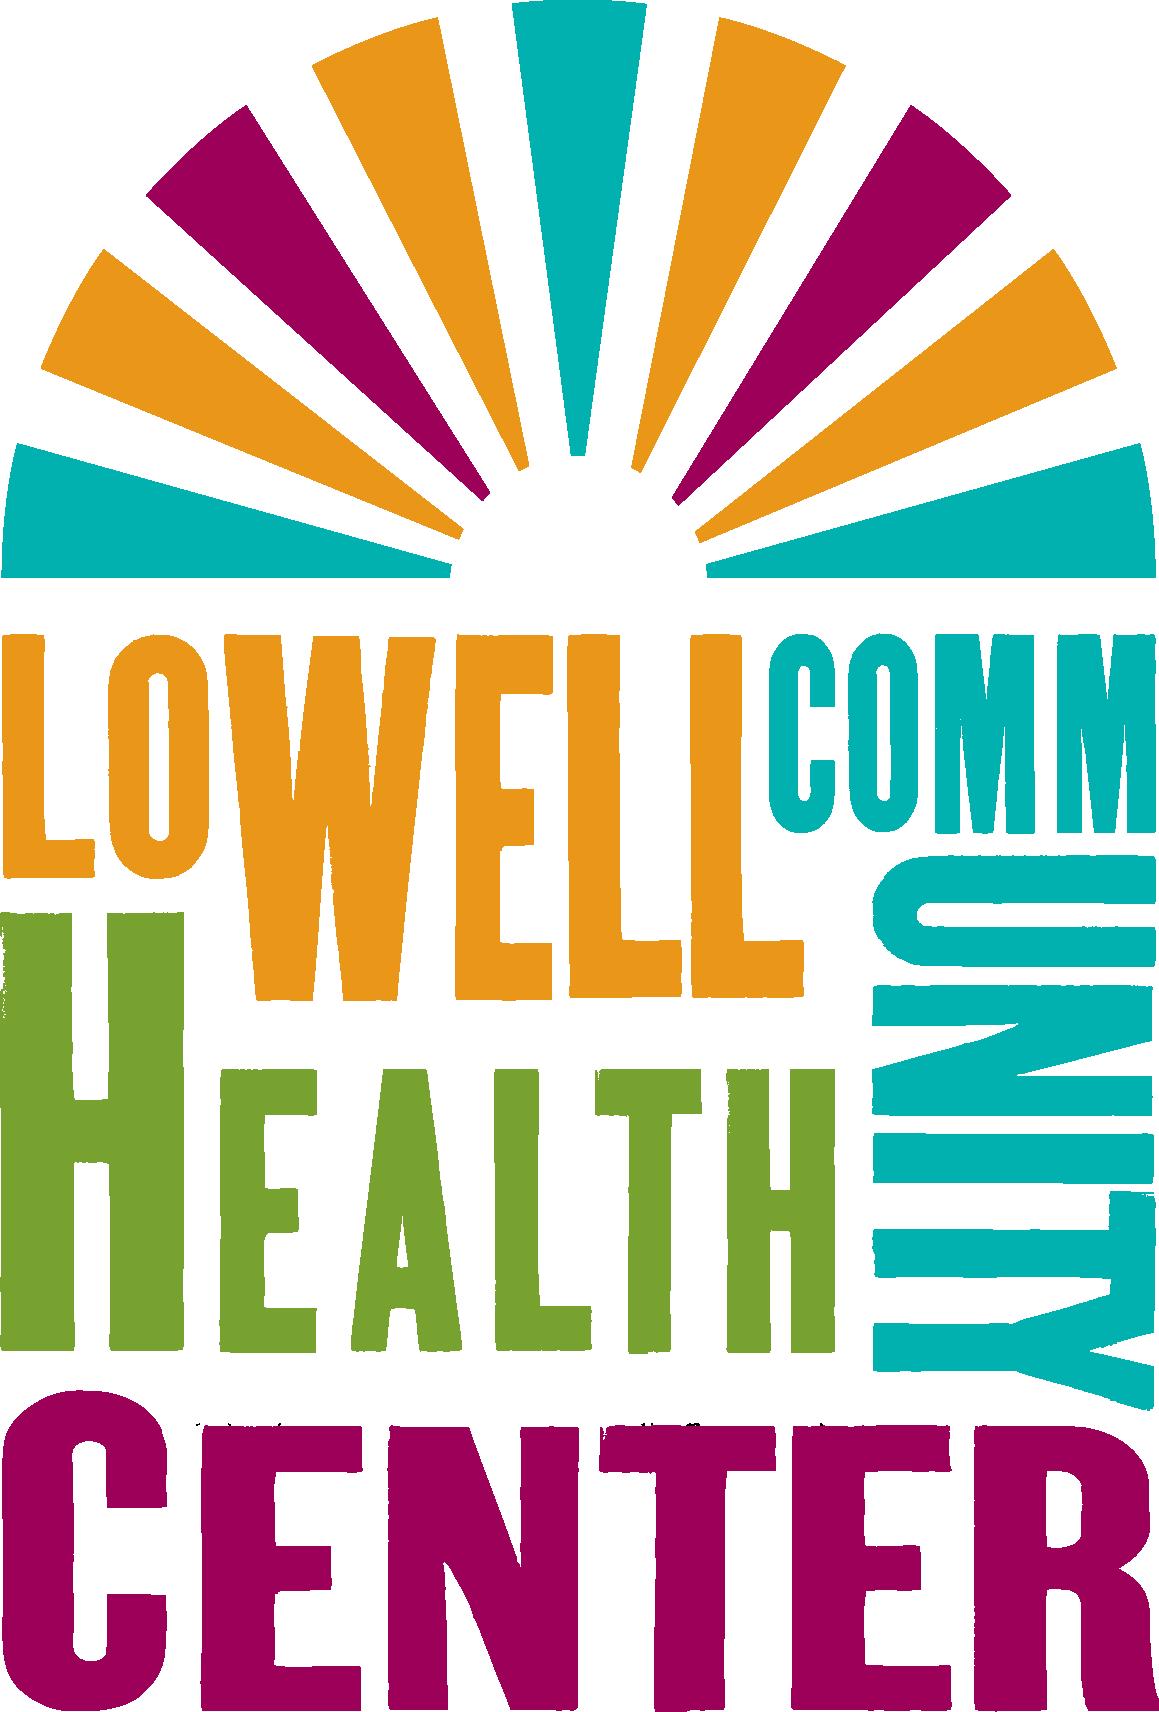 Community clipart community health. Lowell center aapcho